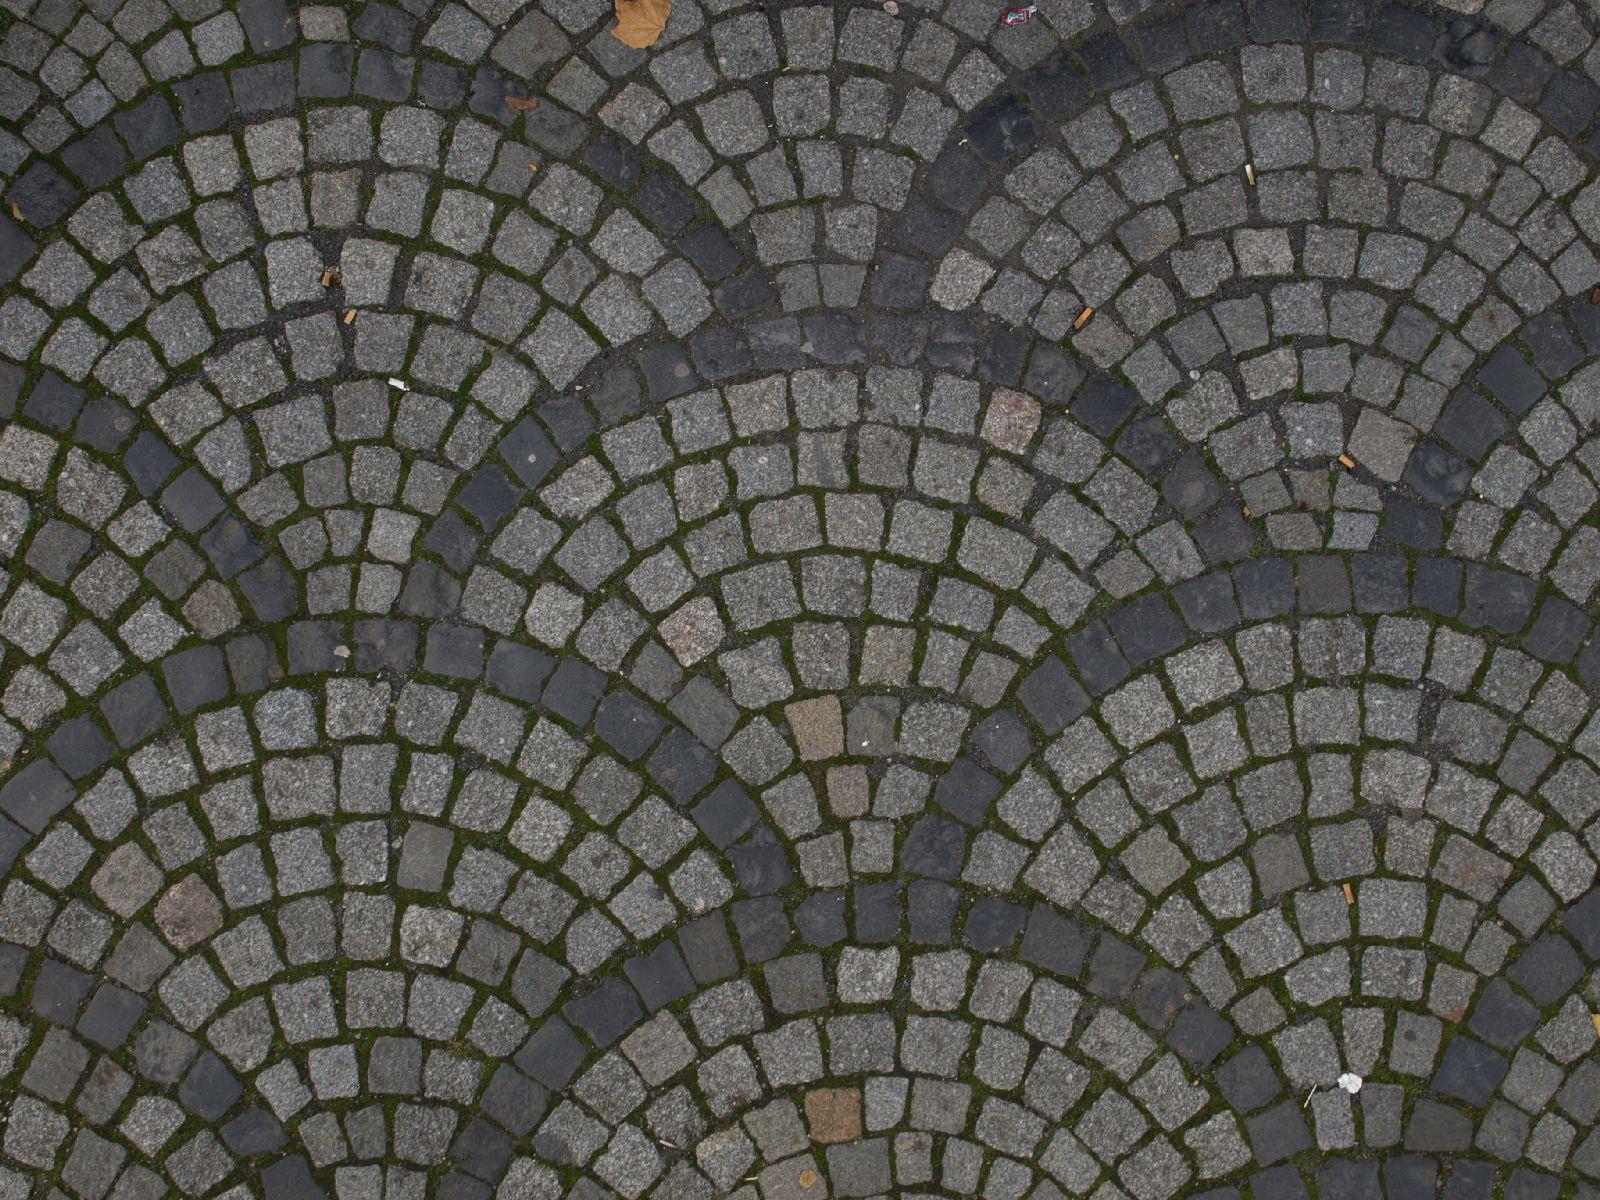 Ground-Urban_Texture_A_PB010851